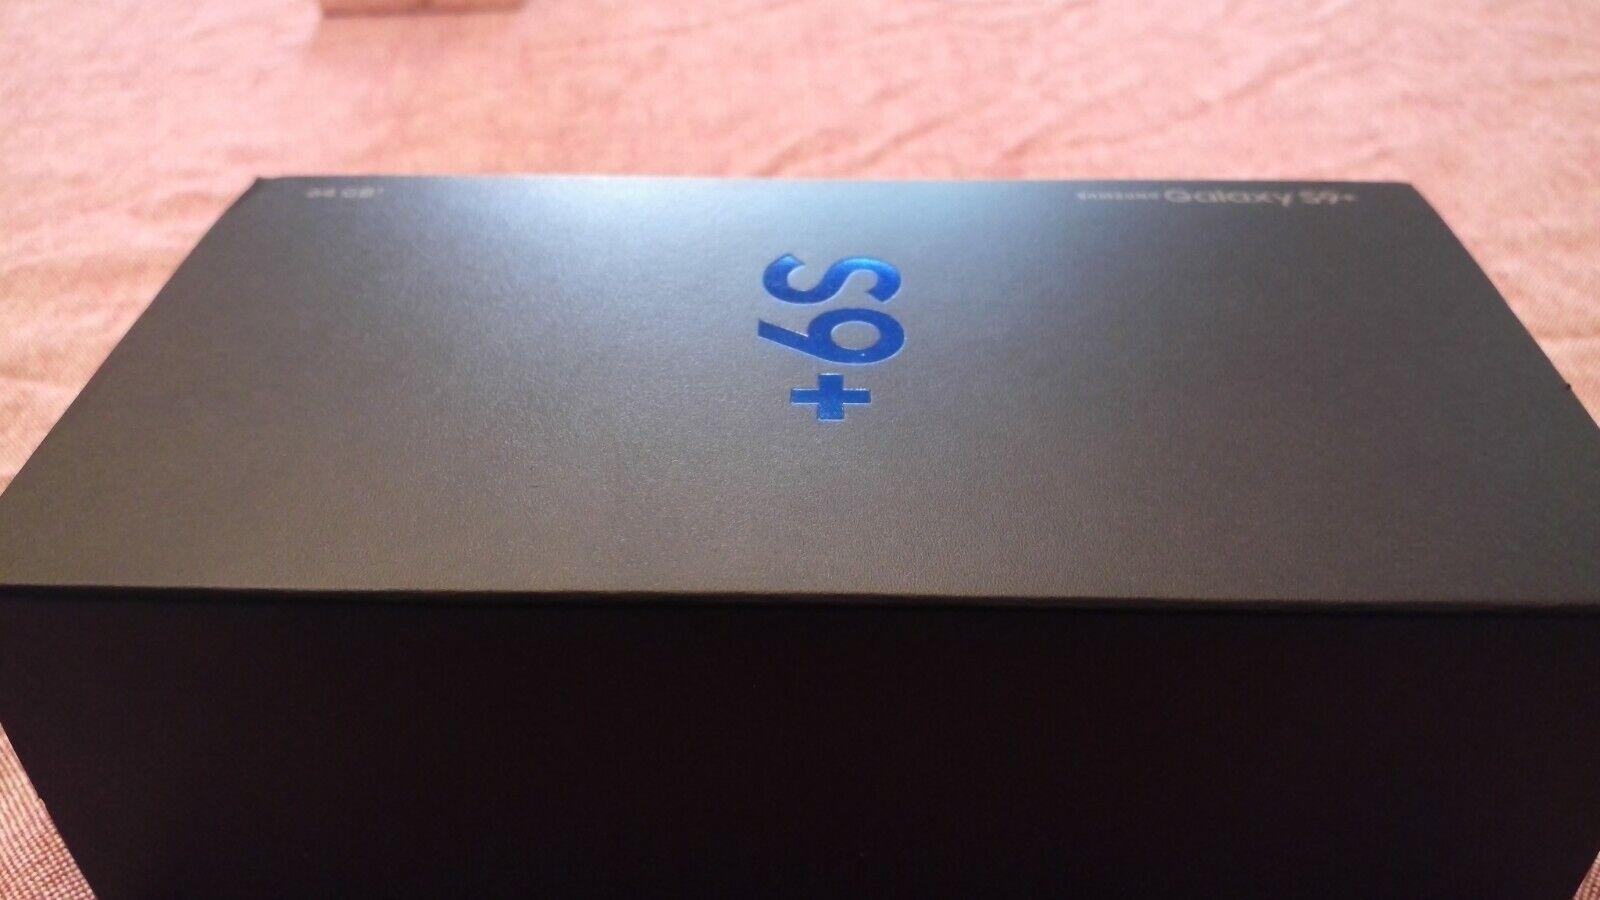 Samsung Galaxy S9+ Unlocked Smartphone - Midnight Black - US